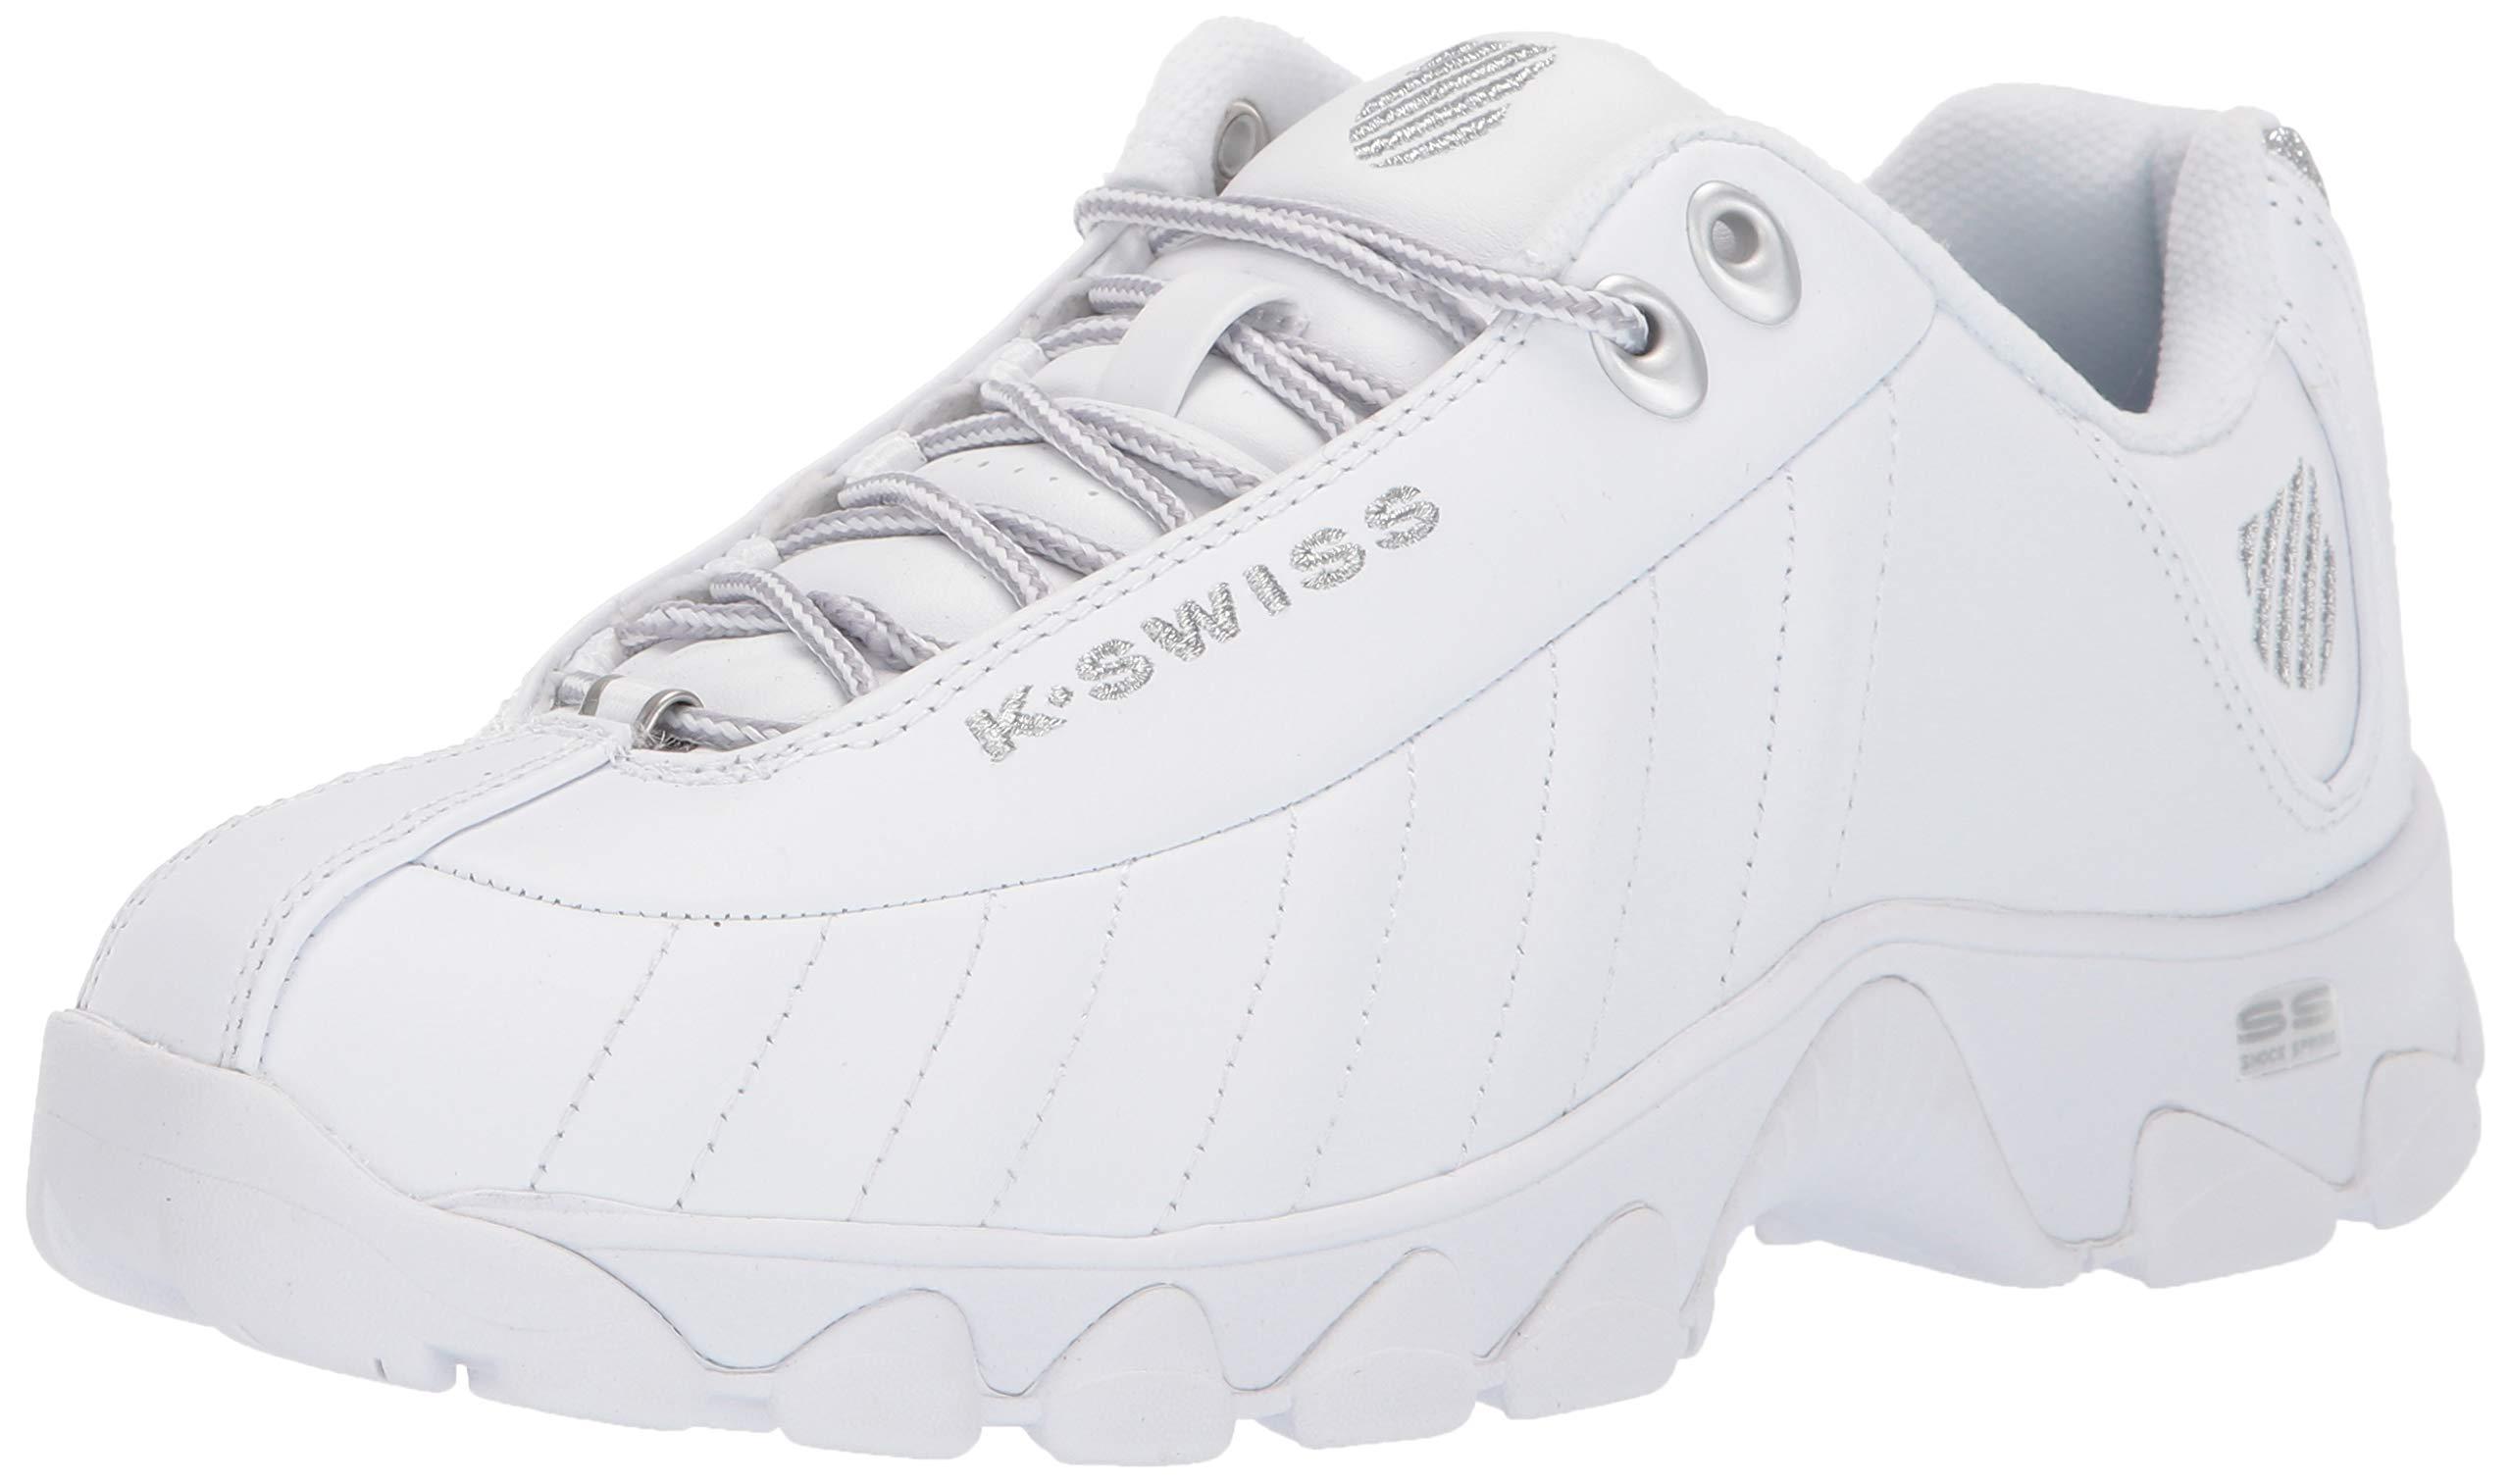 ST329 CMF Sneaker, White/silver Glitter